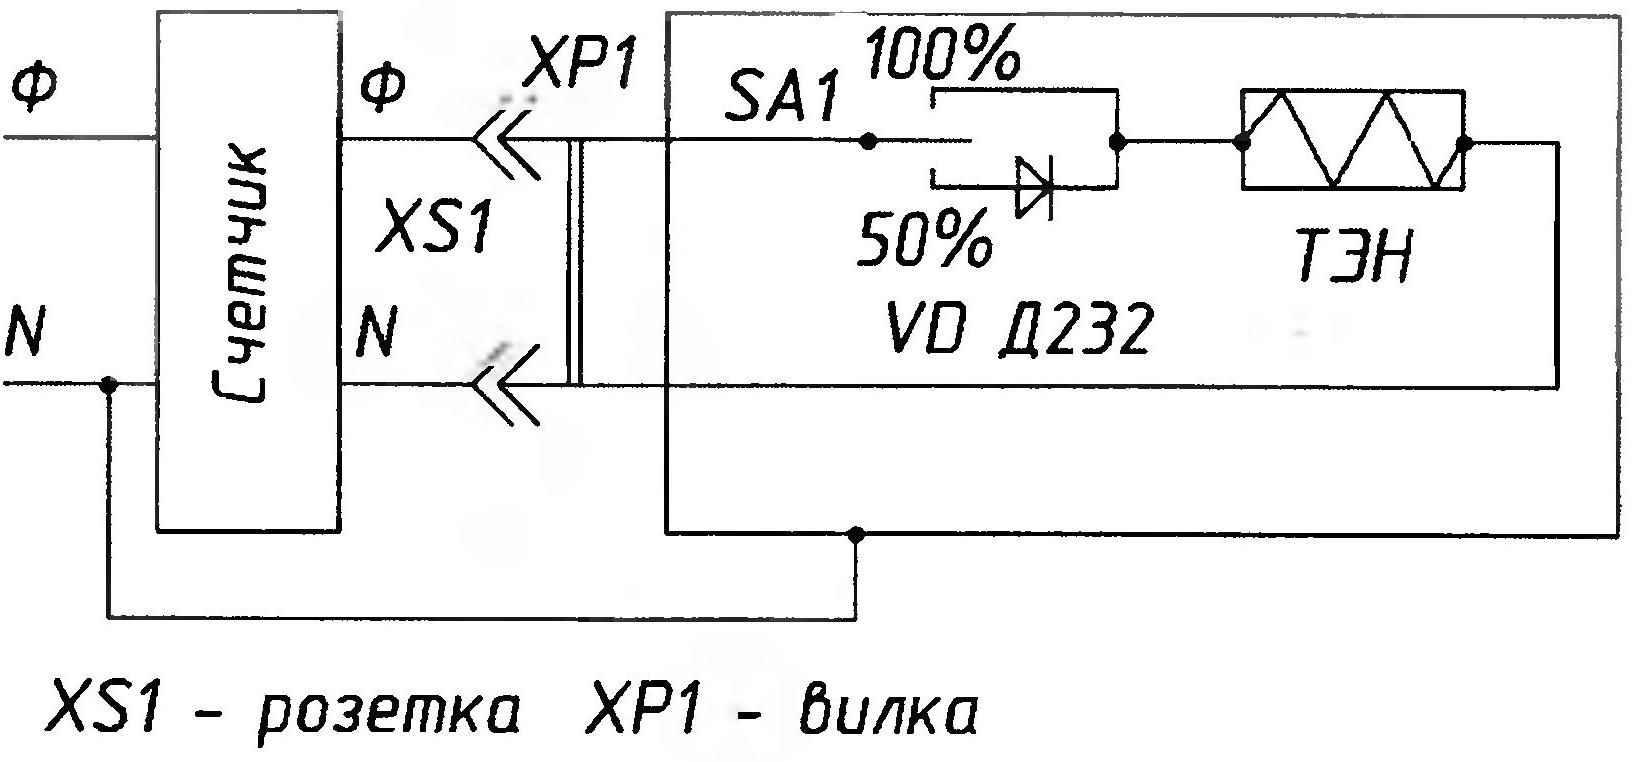 Терморегулятор для электроплитки своими руками5